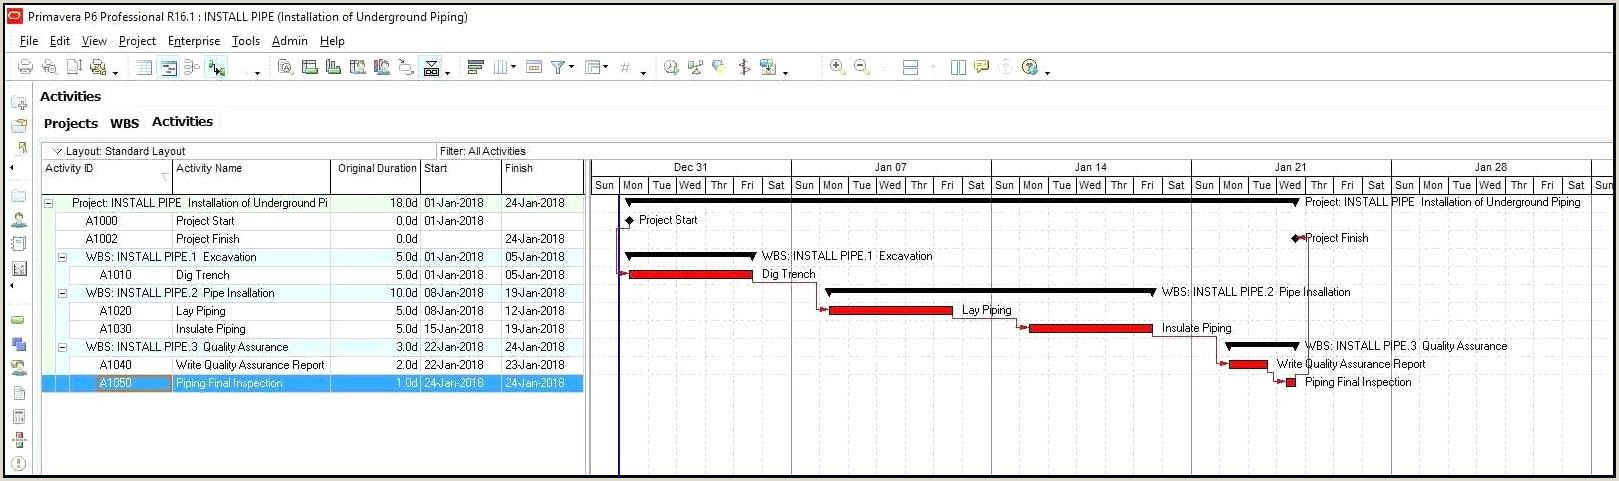 Dj Invoice Template Blank Invoice Template Google Docs 3194